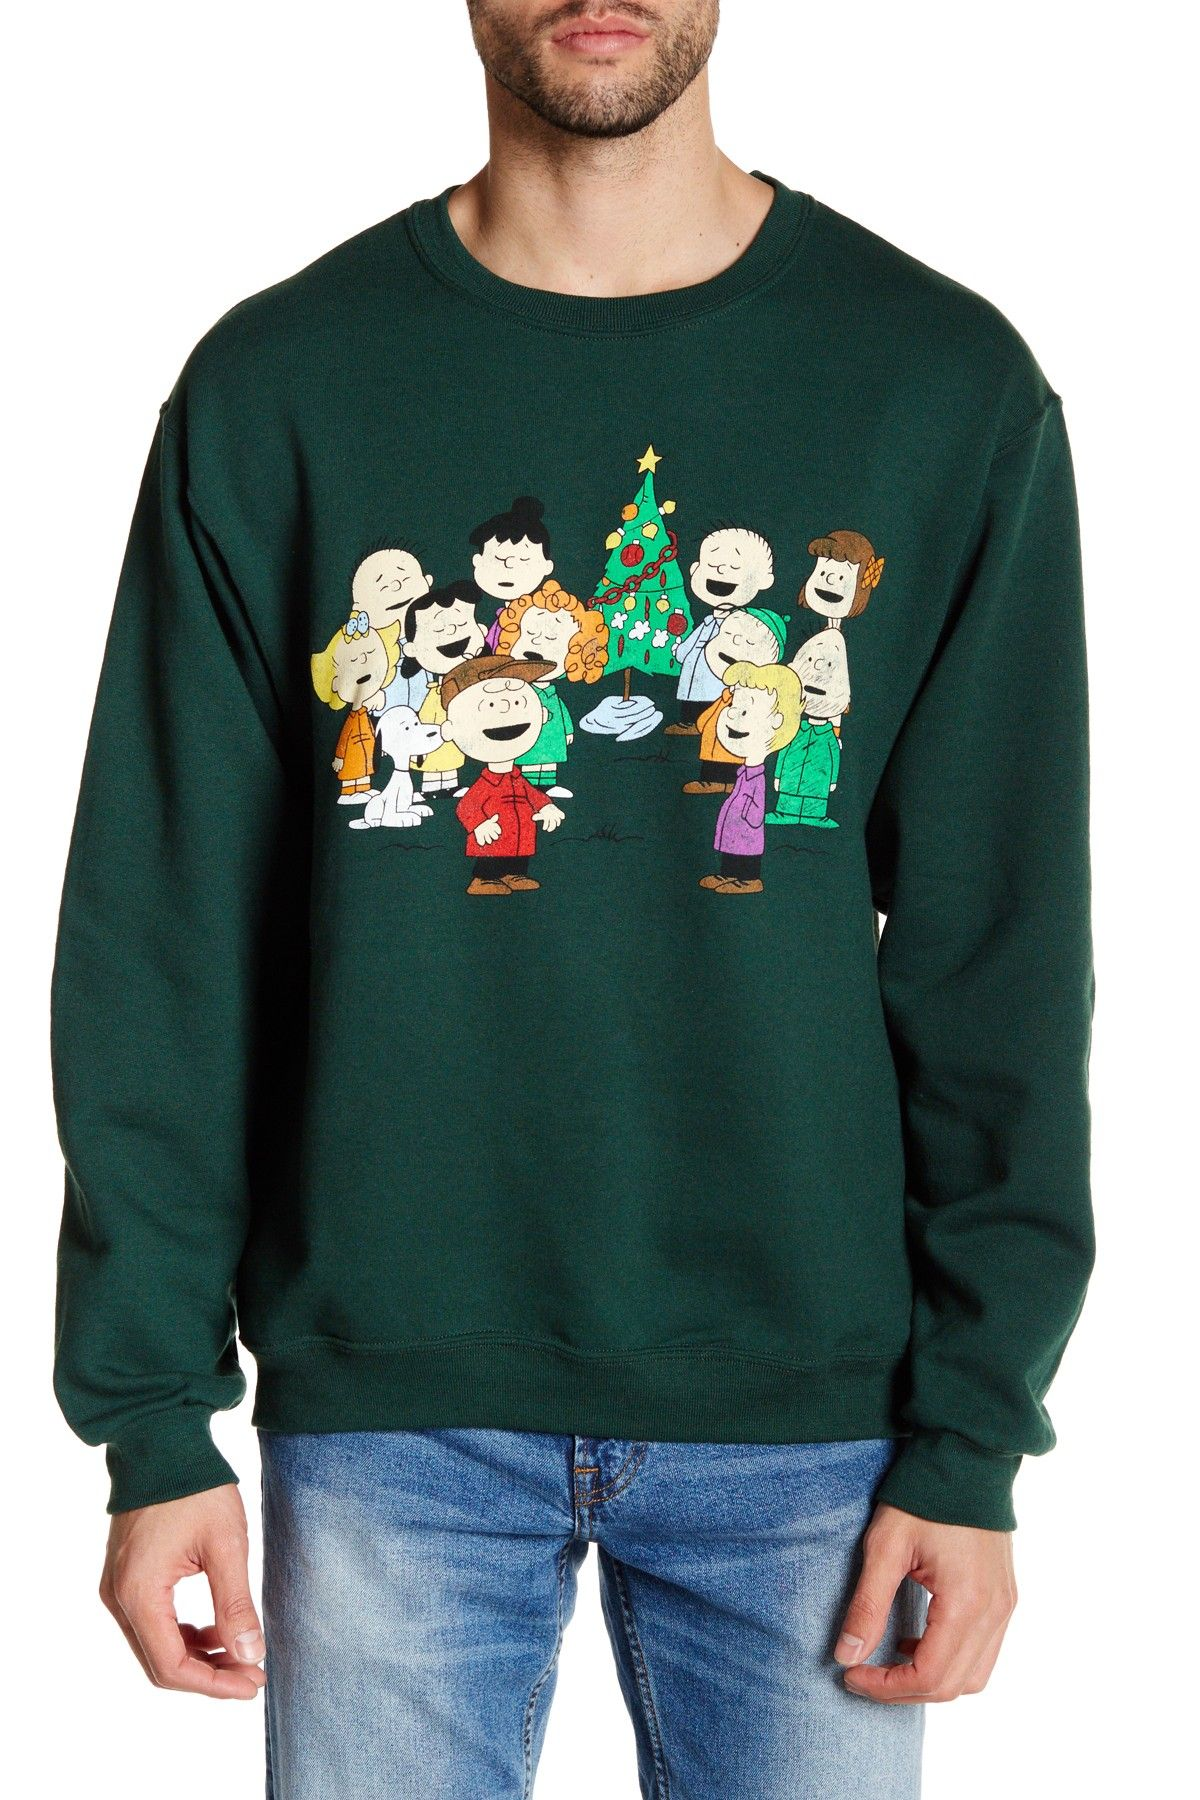 Peanut Christmas Sing Along Sweatshirt